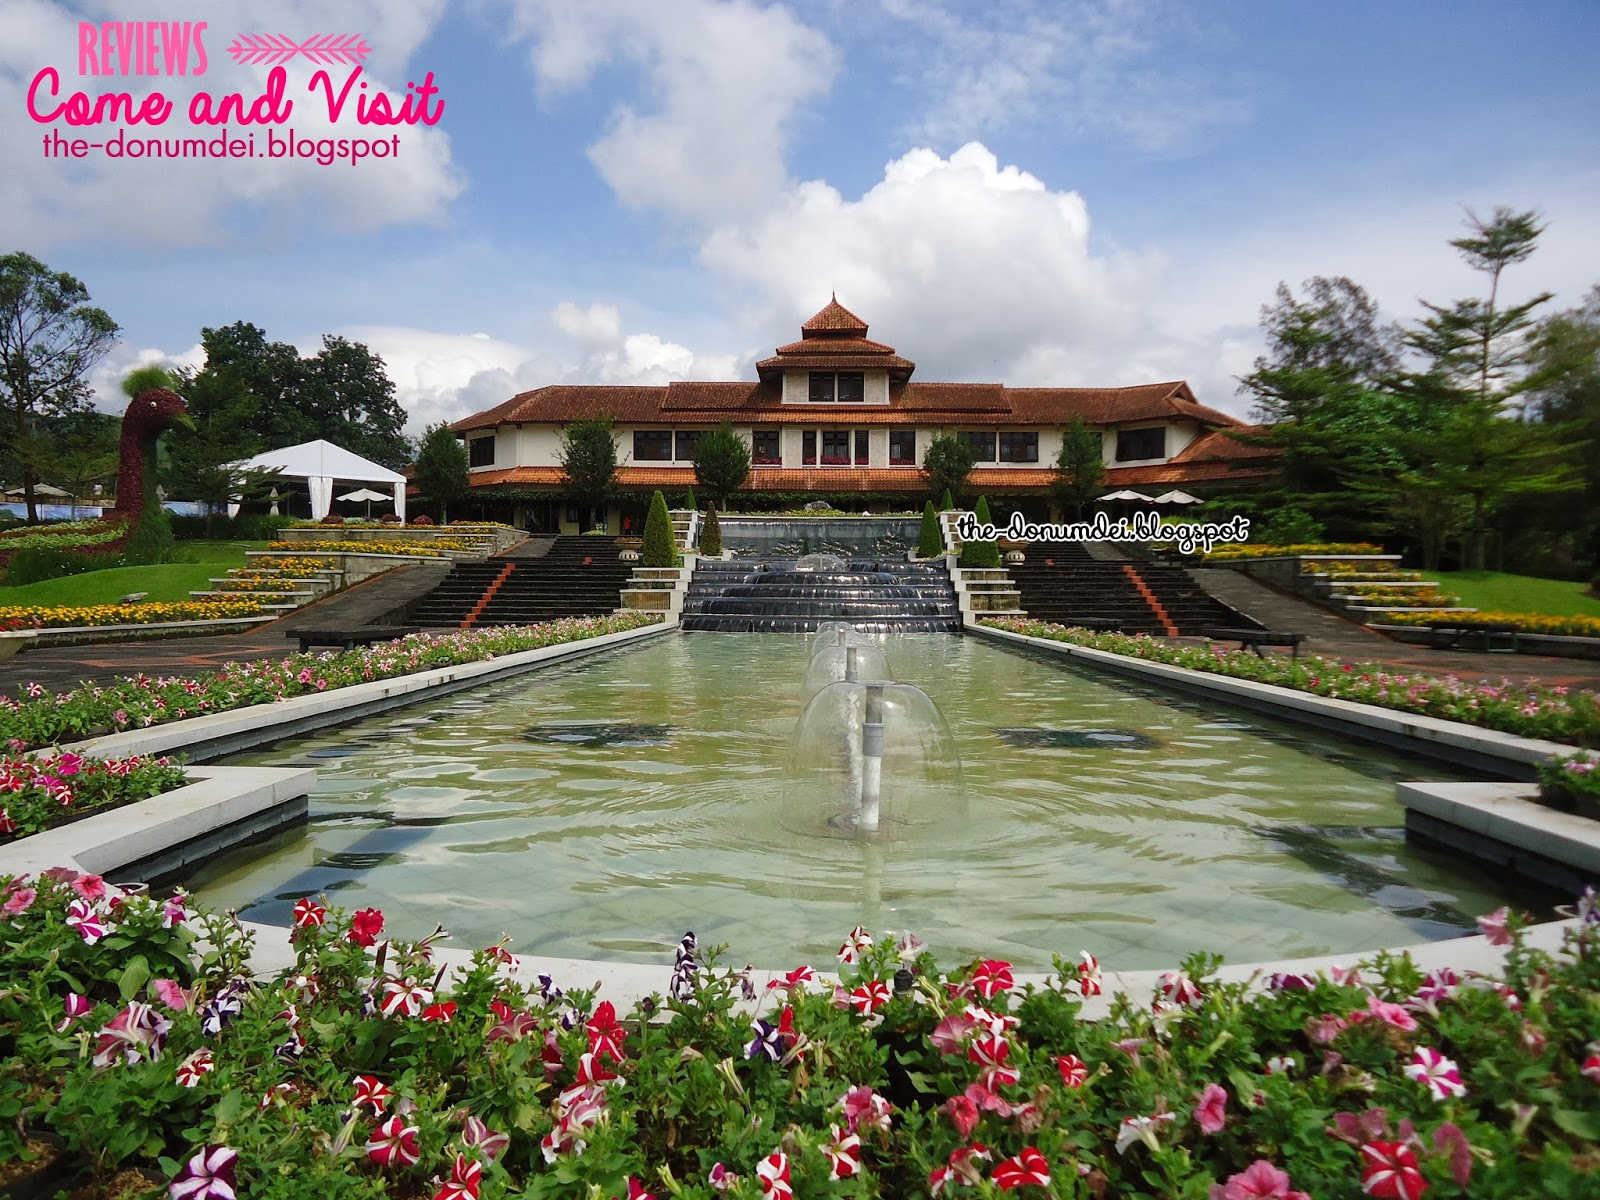 Donumdei Taman Bunga Nusantara Cianjur Puncak